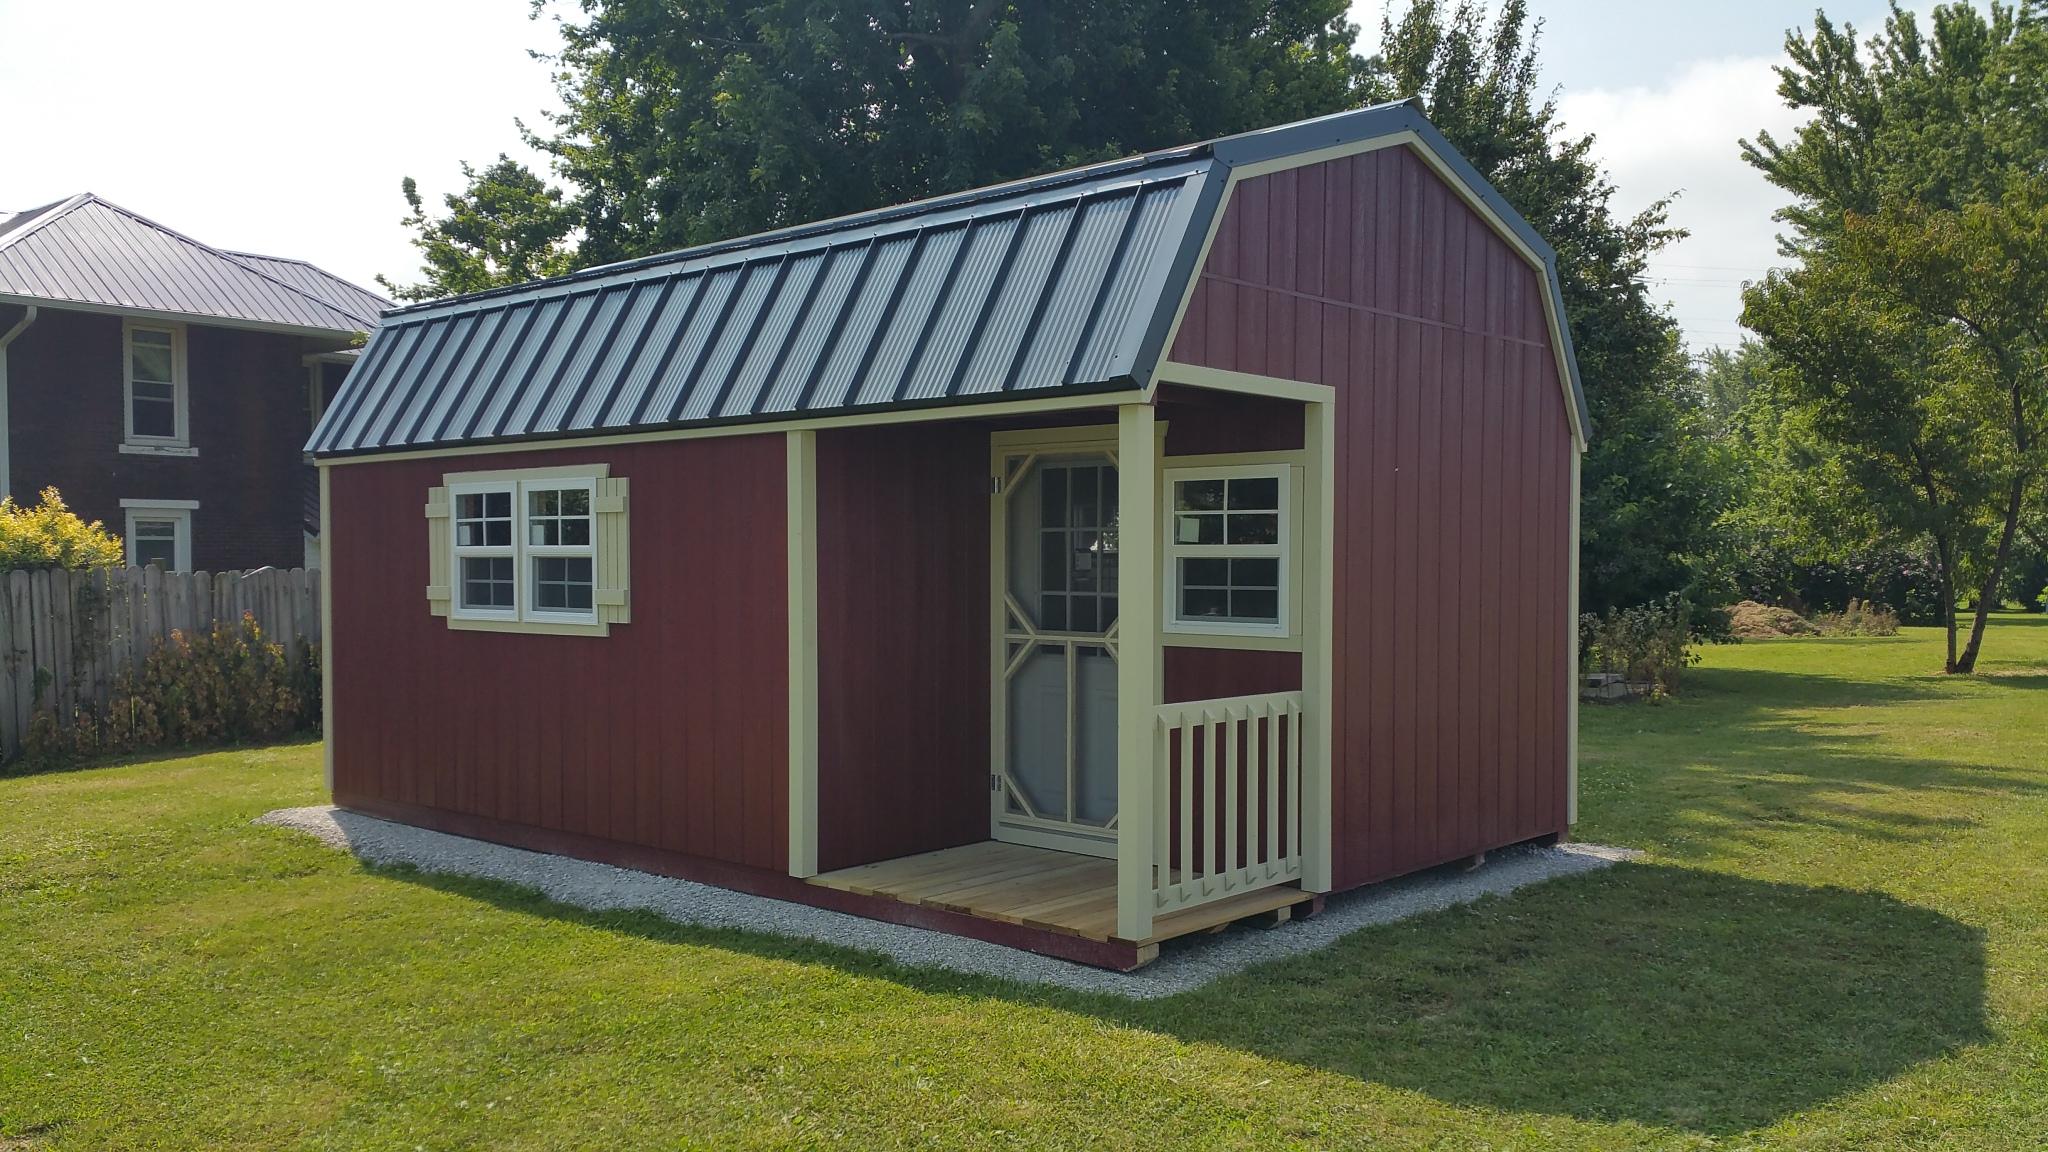 12x20 Gambrel Barn With Side Porch